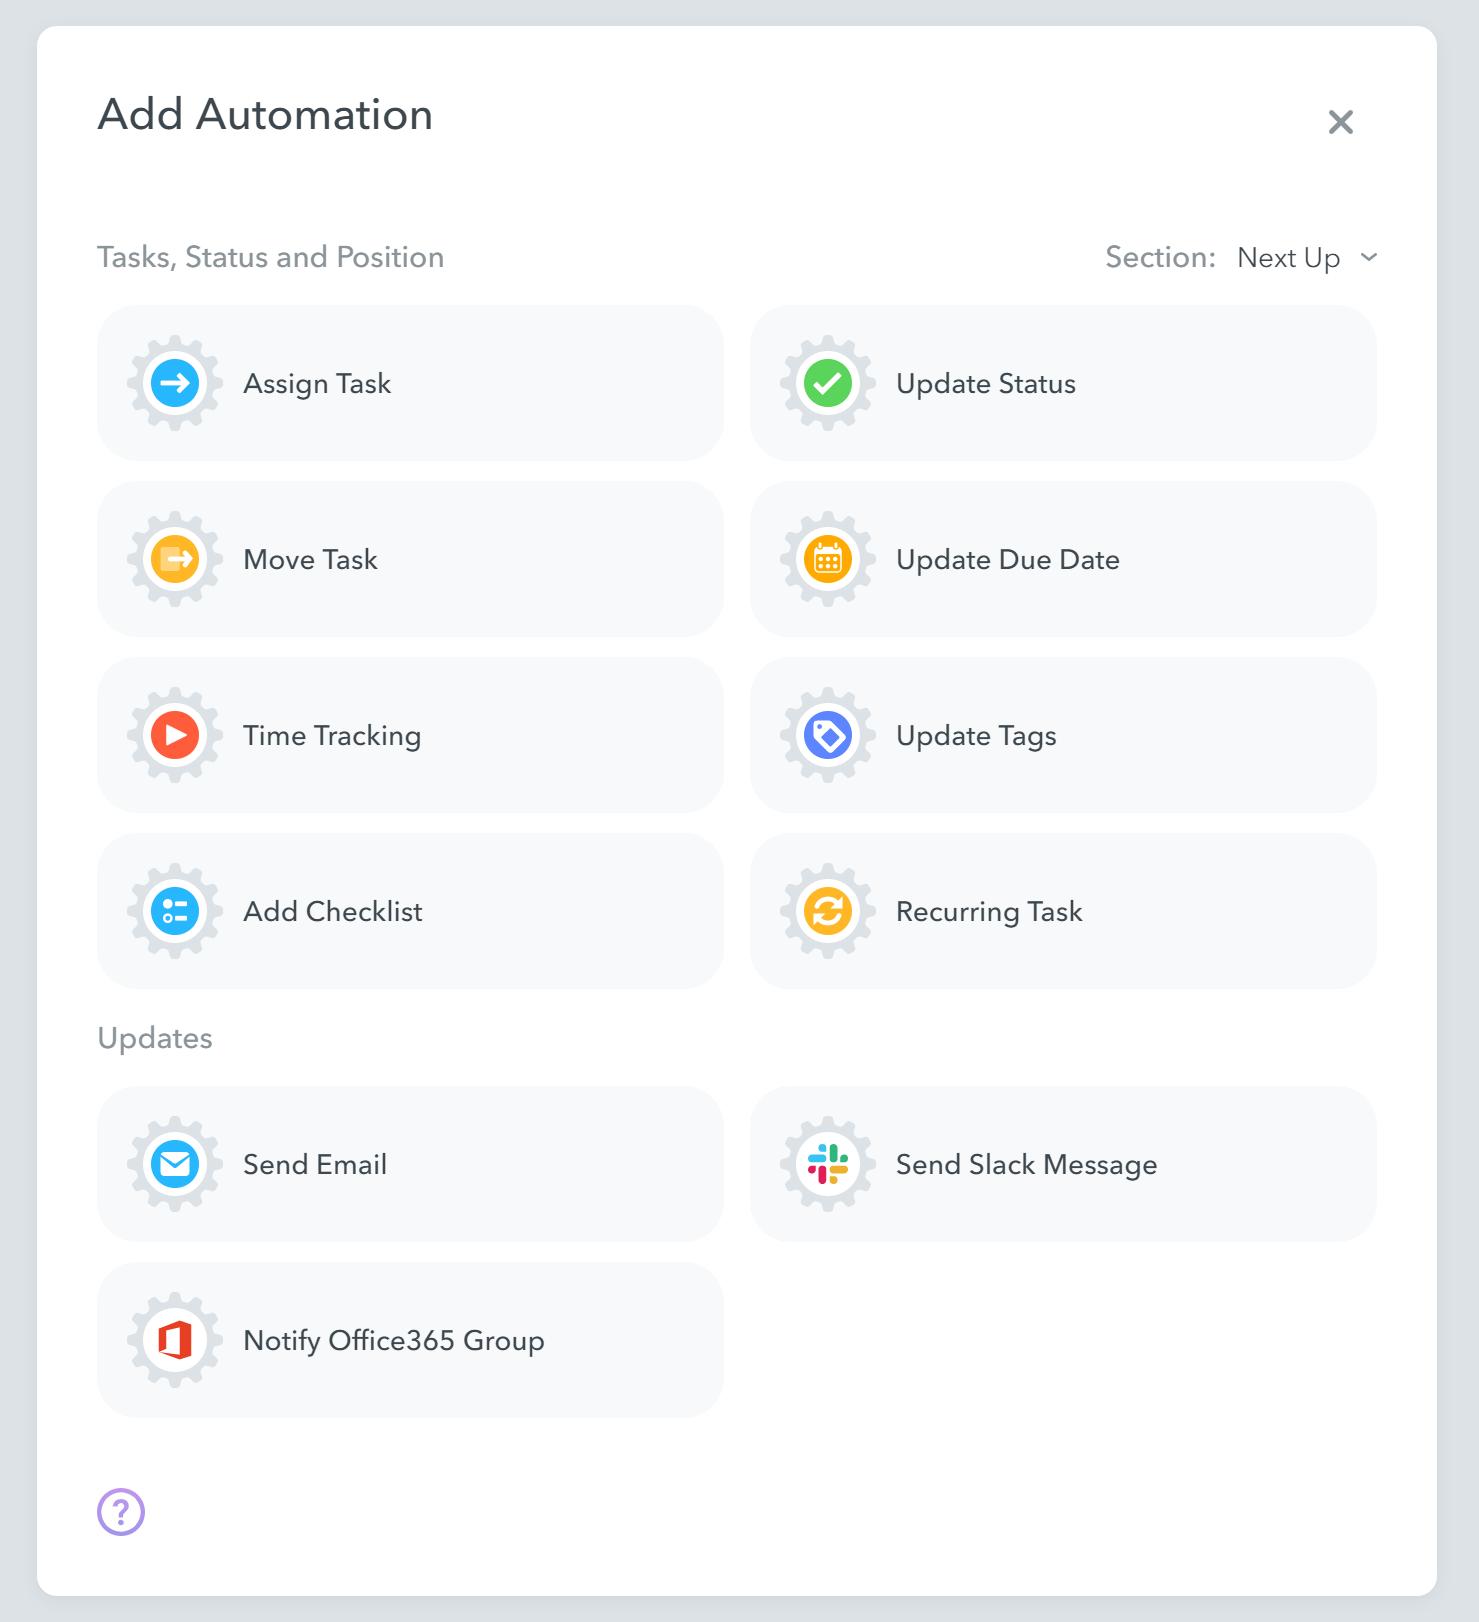 Marketing___MeisterTask_-_Google_Chrome_2019-07-30_14.23.22.png